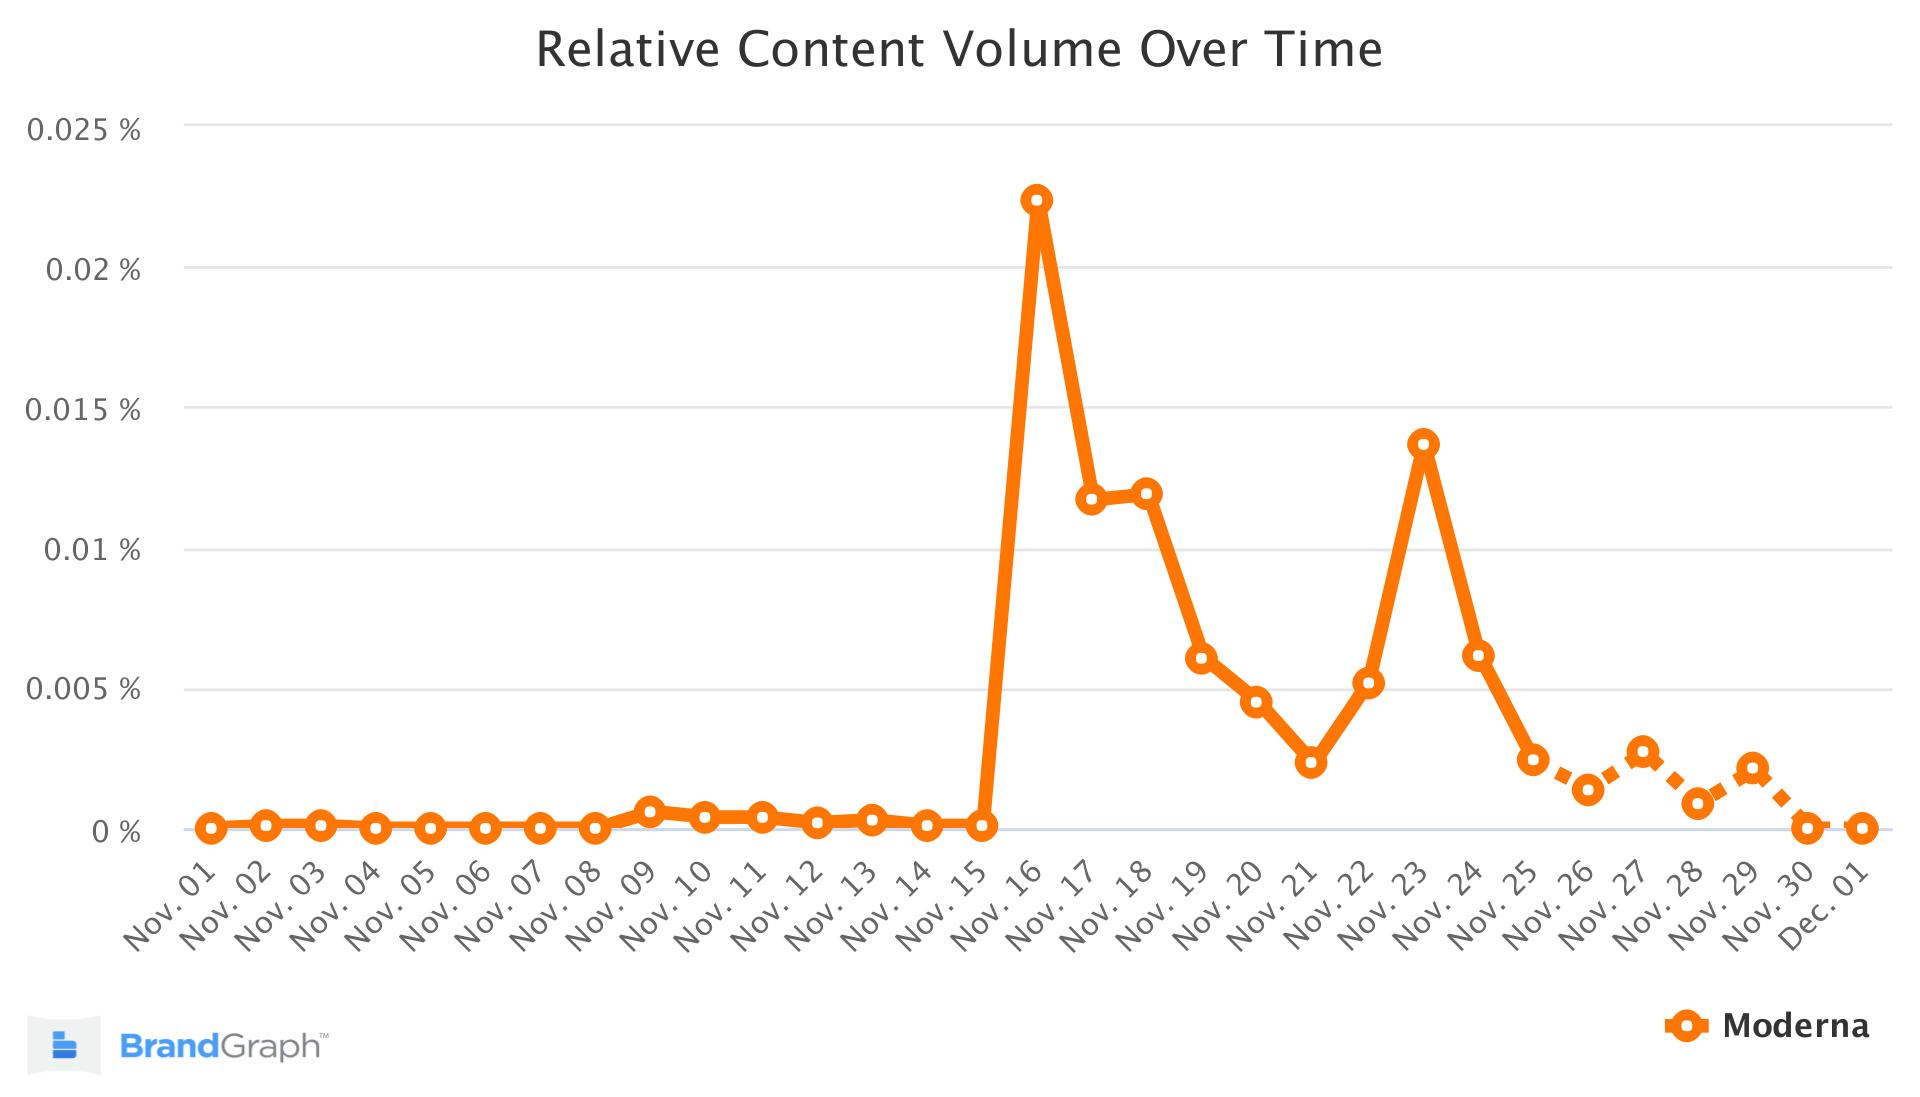 Moderna BrandGraph Trend